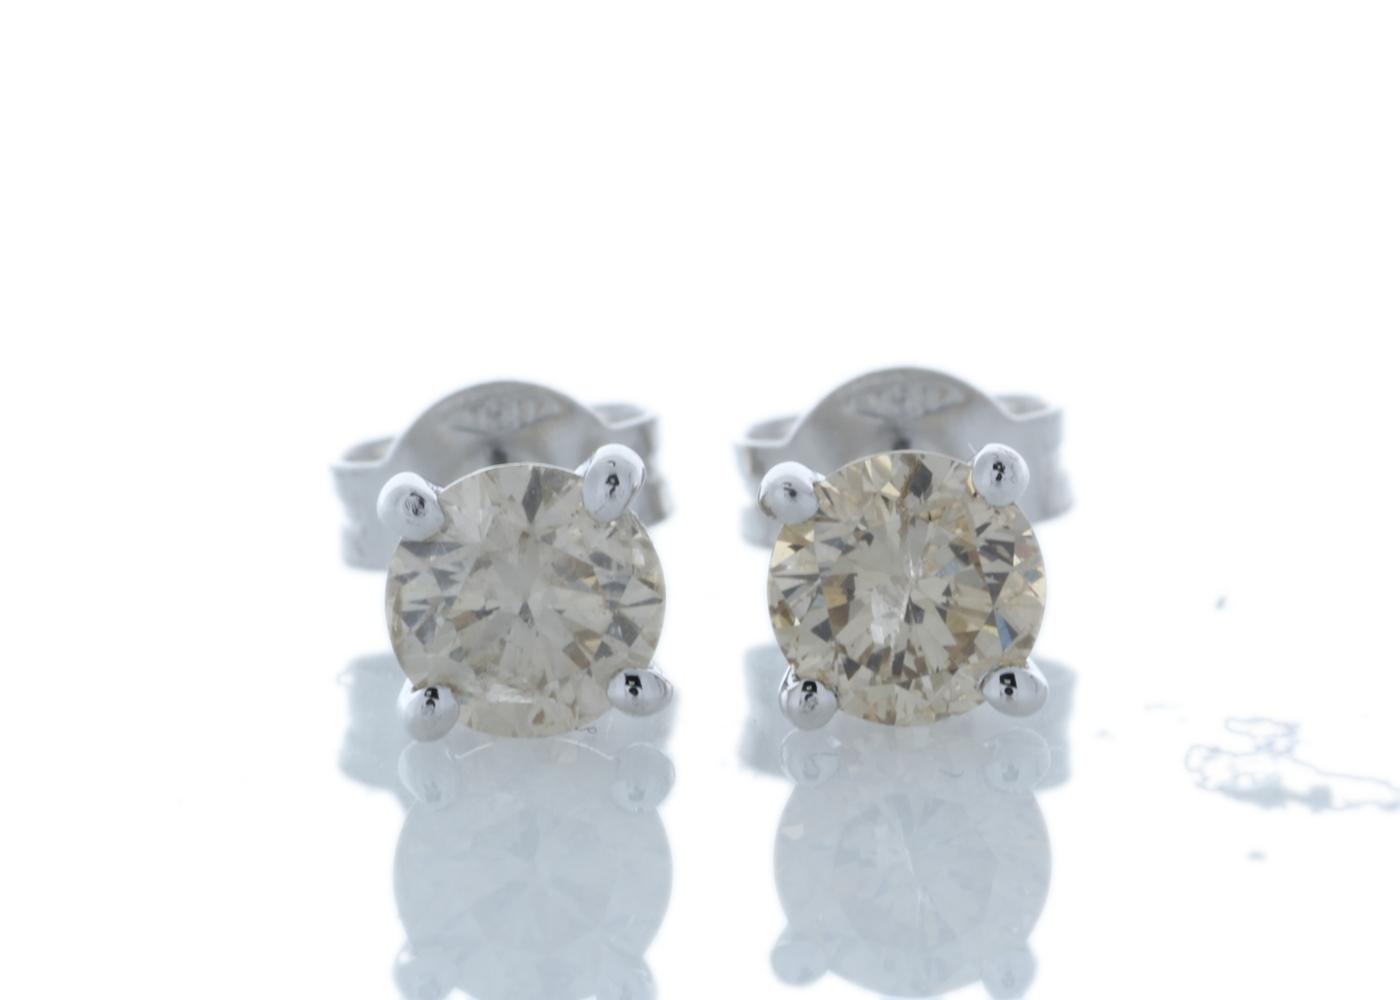 18ct White Gold Prong Set Diamond Earrings 1.22 Carats